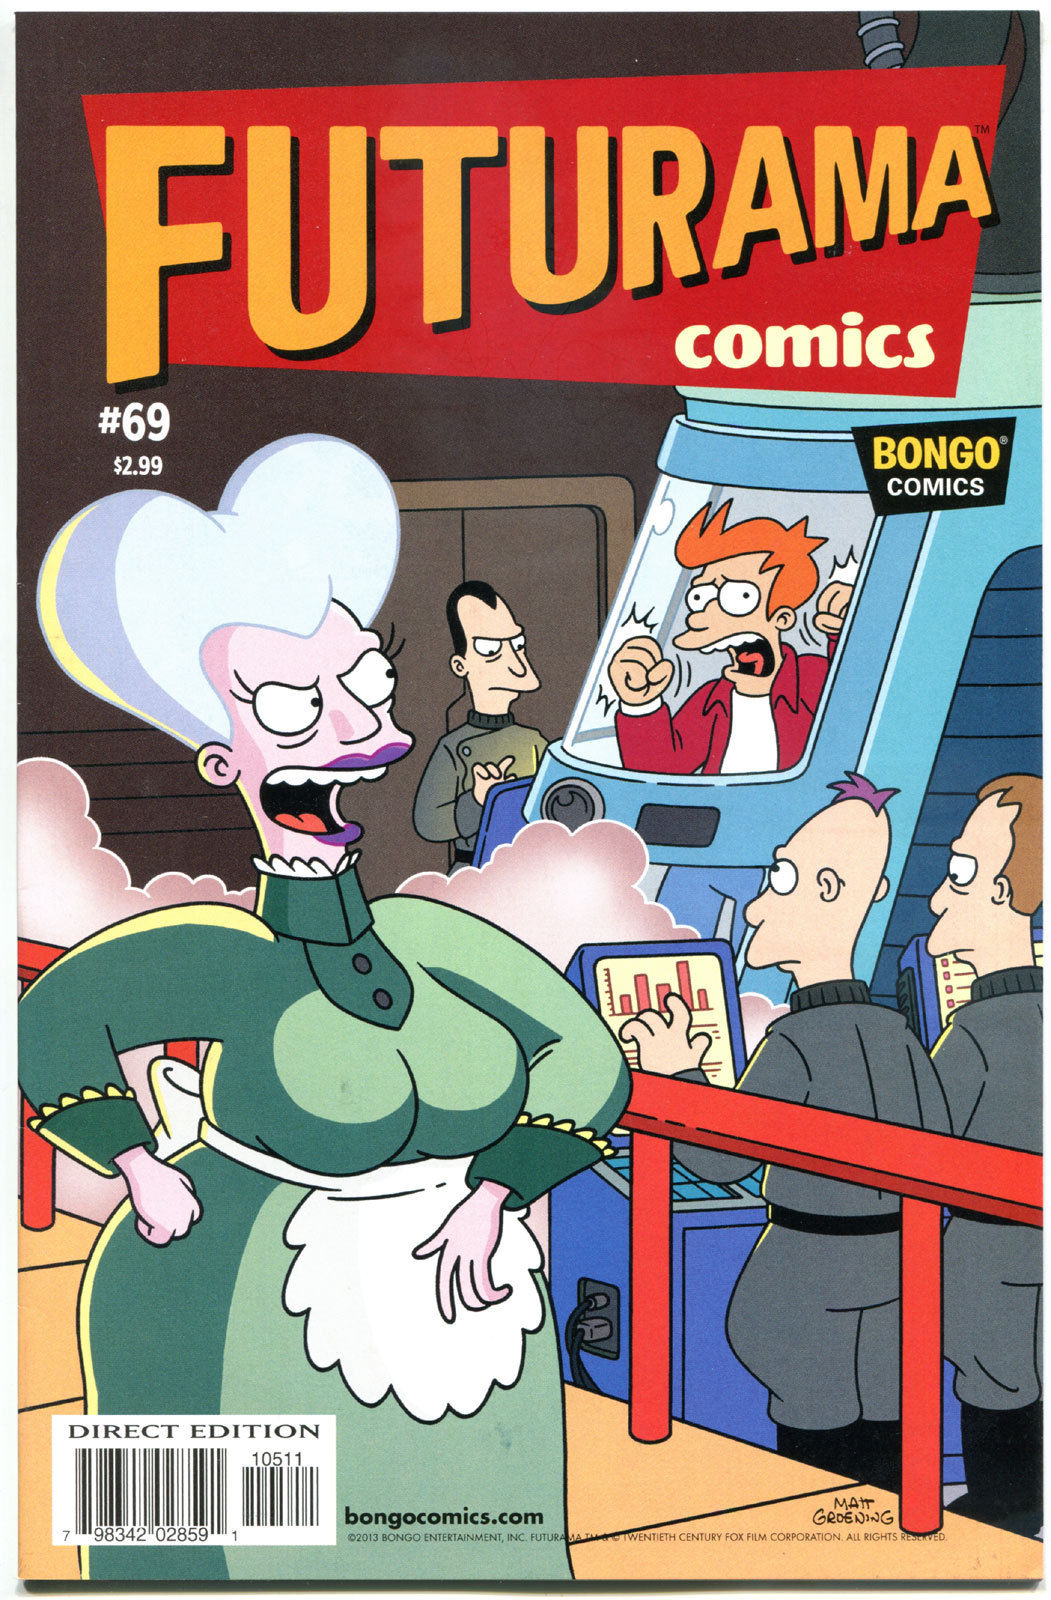 FUTURAMA #69, NM, Bongo, Fry, Bender, Leela, Prof Farnsworth, more in store